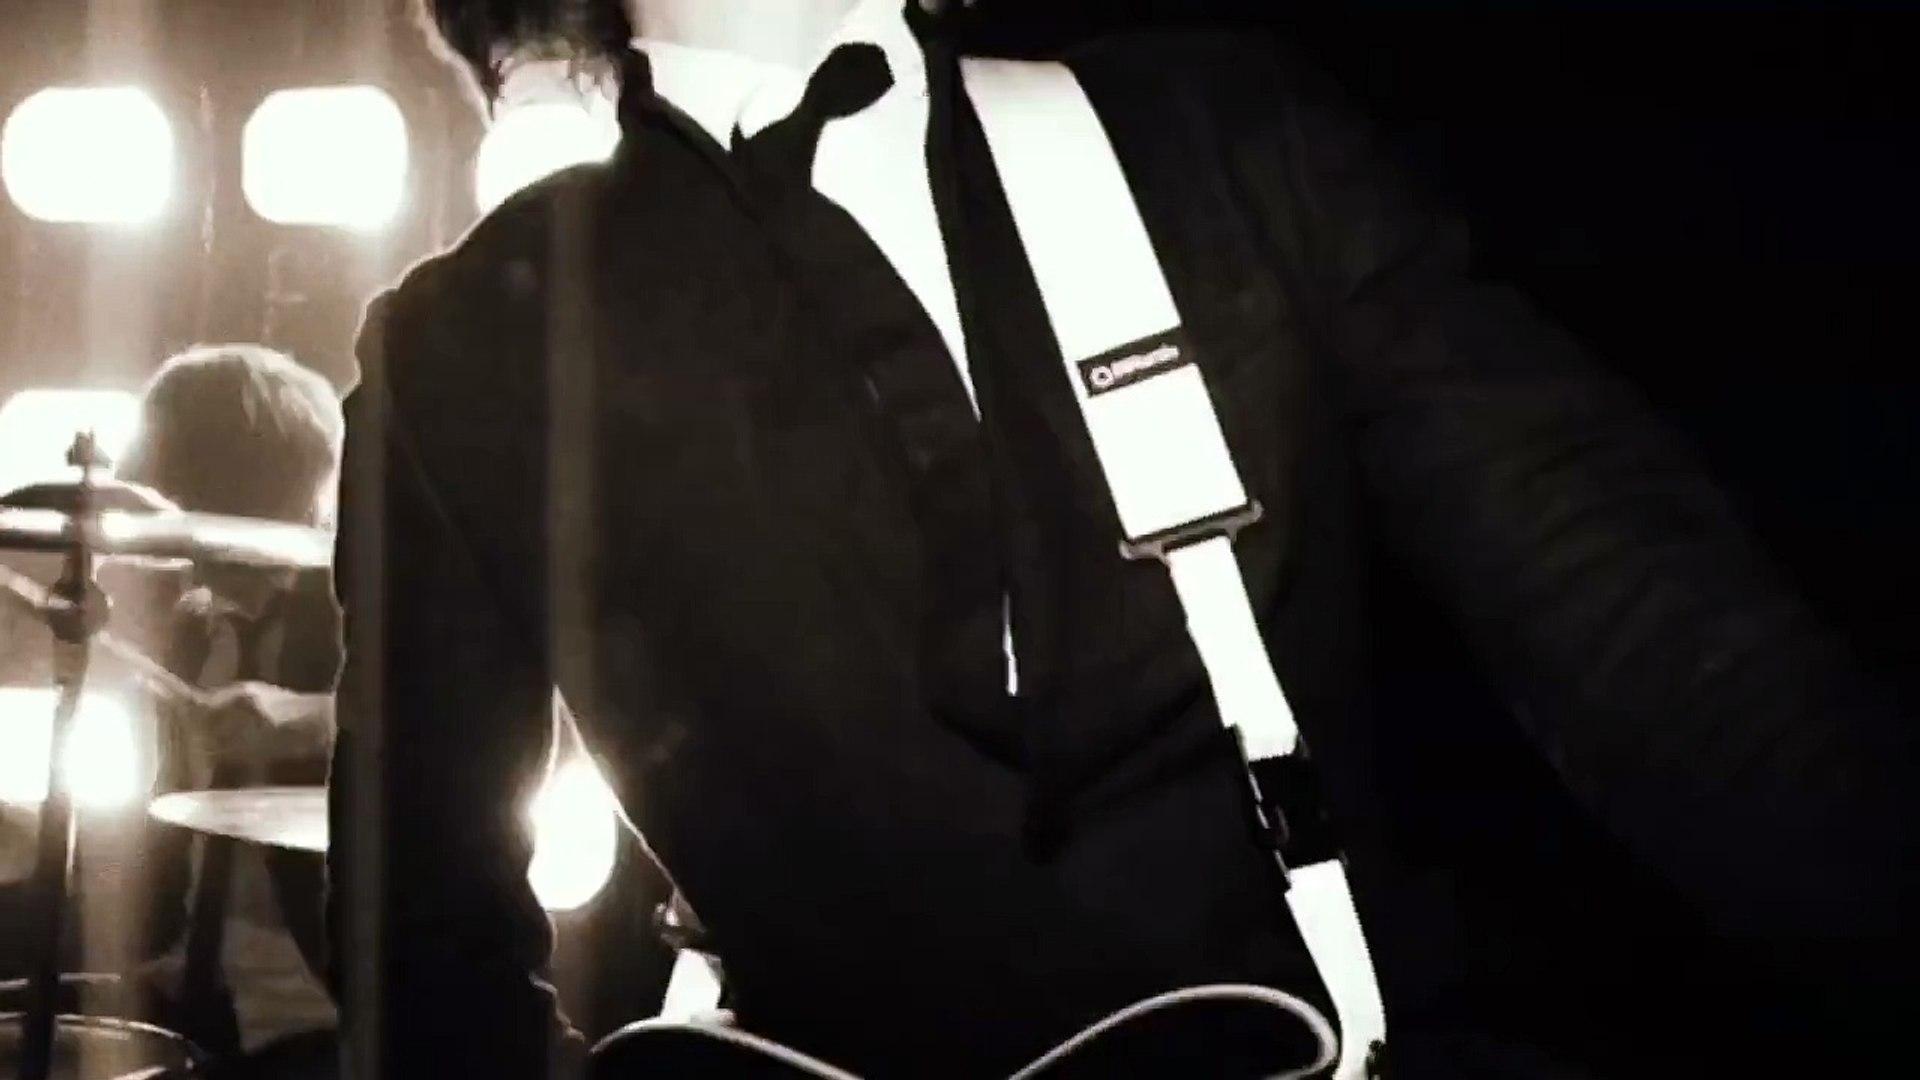 Alesana - 'The Thespian' (Video)